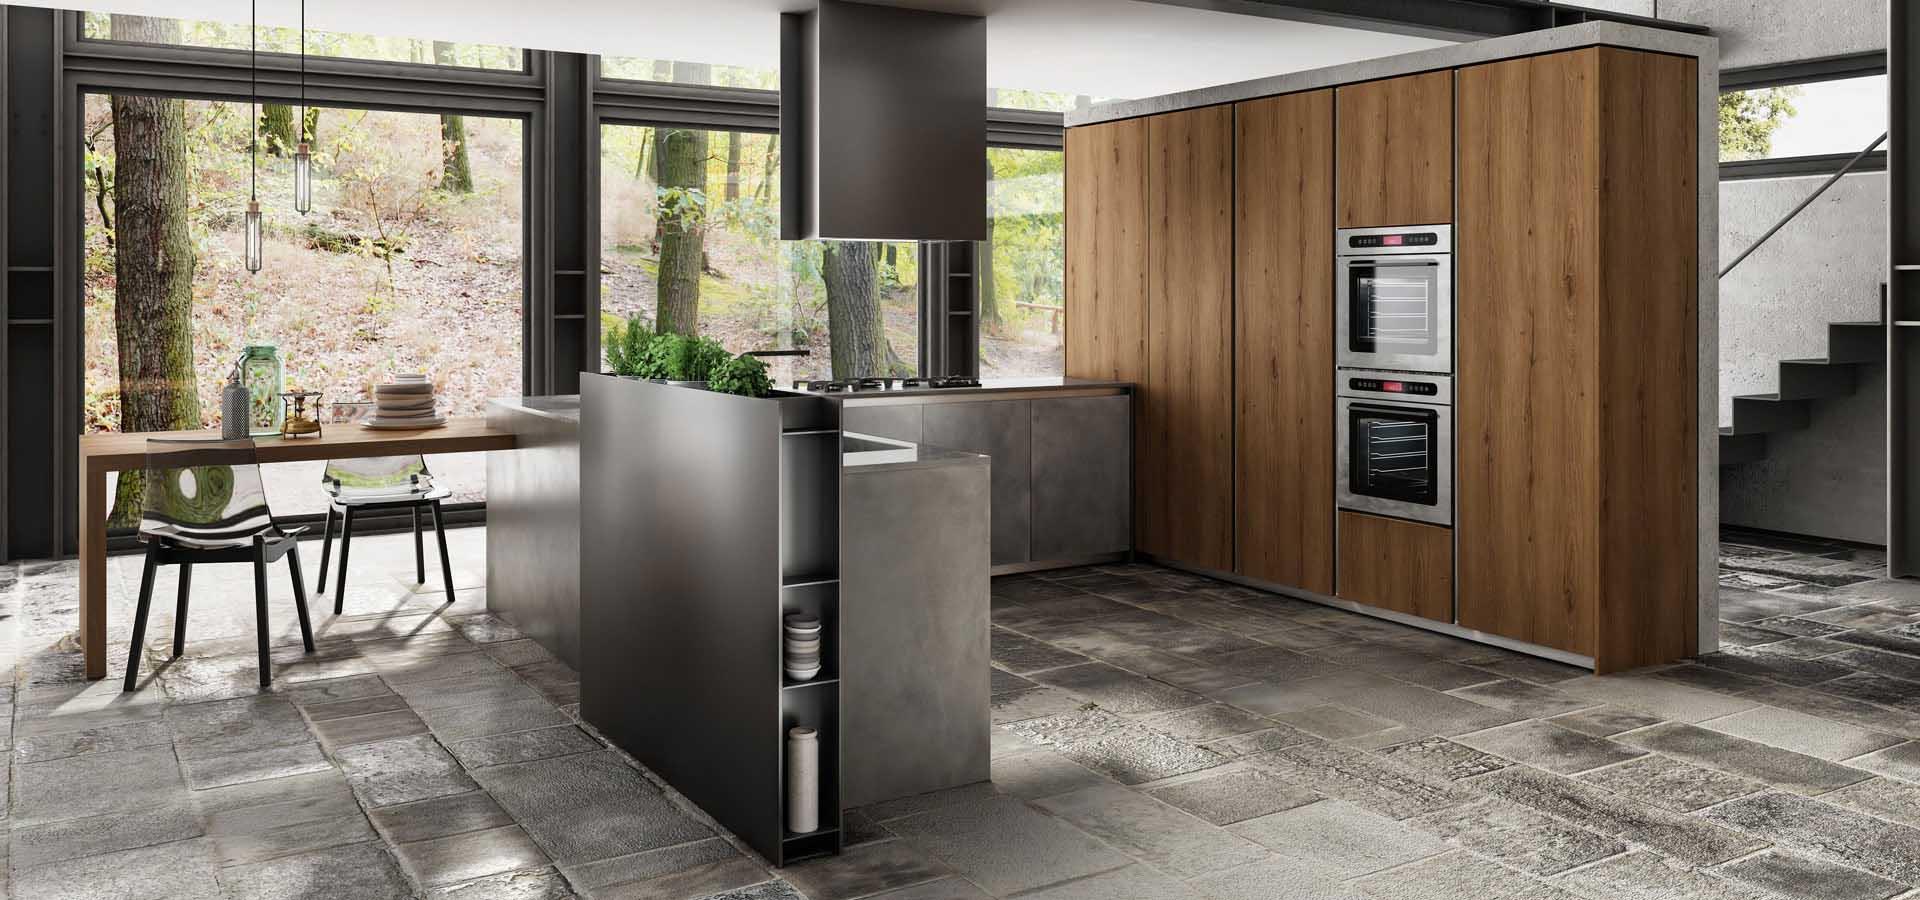 Vendita cucine moderne a padova for Cucine arredo tre